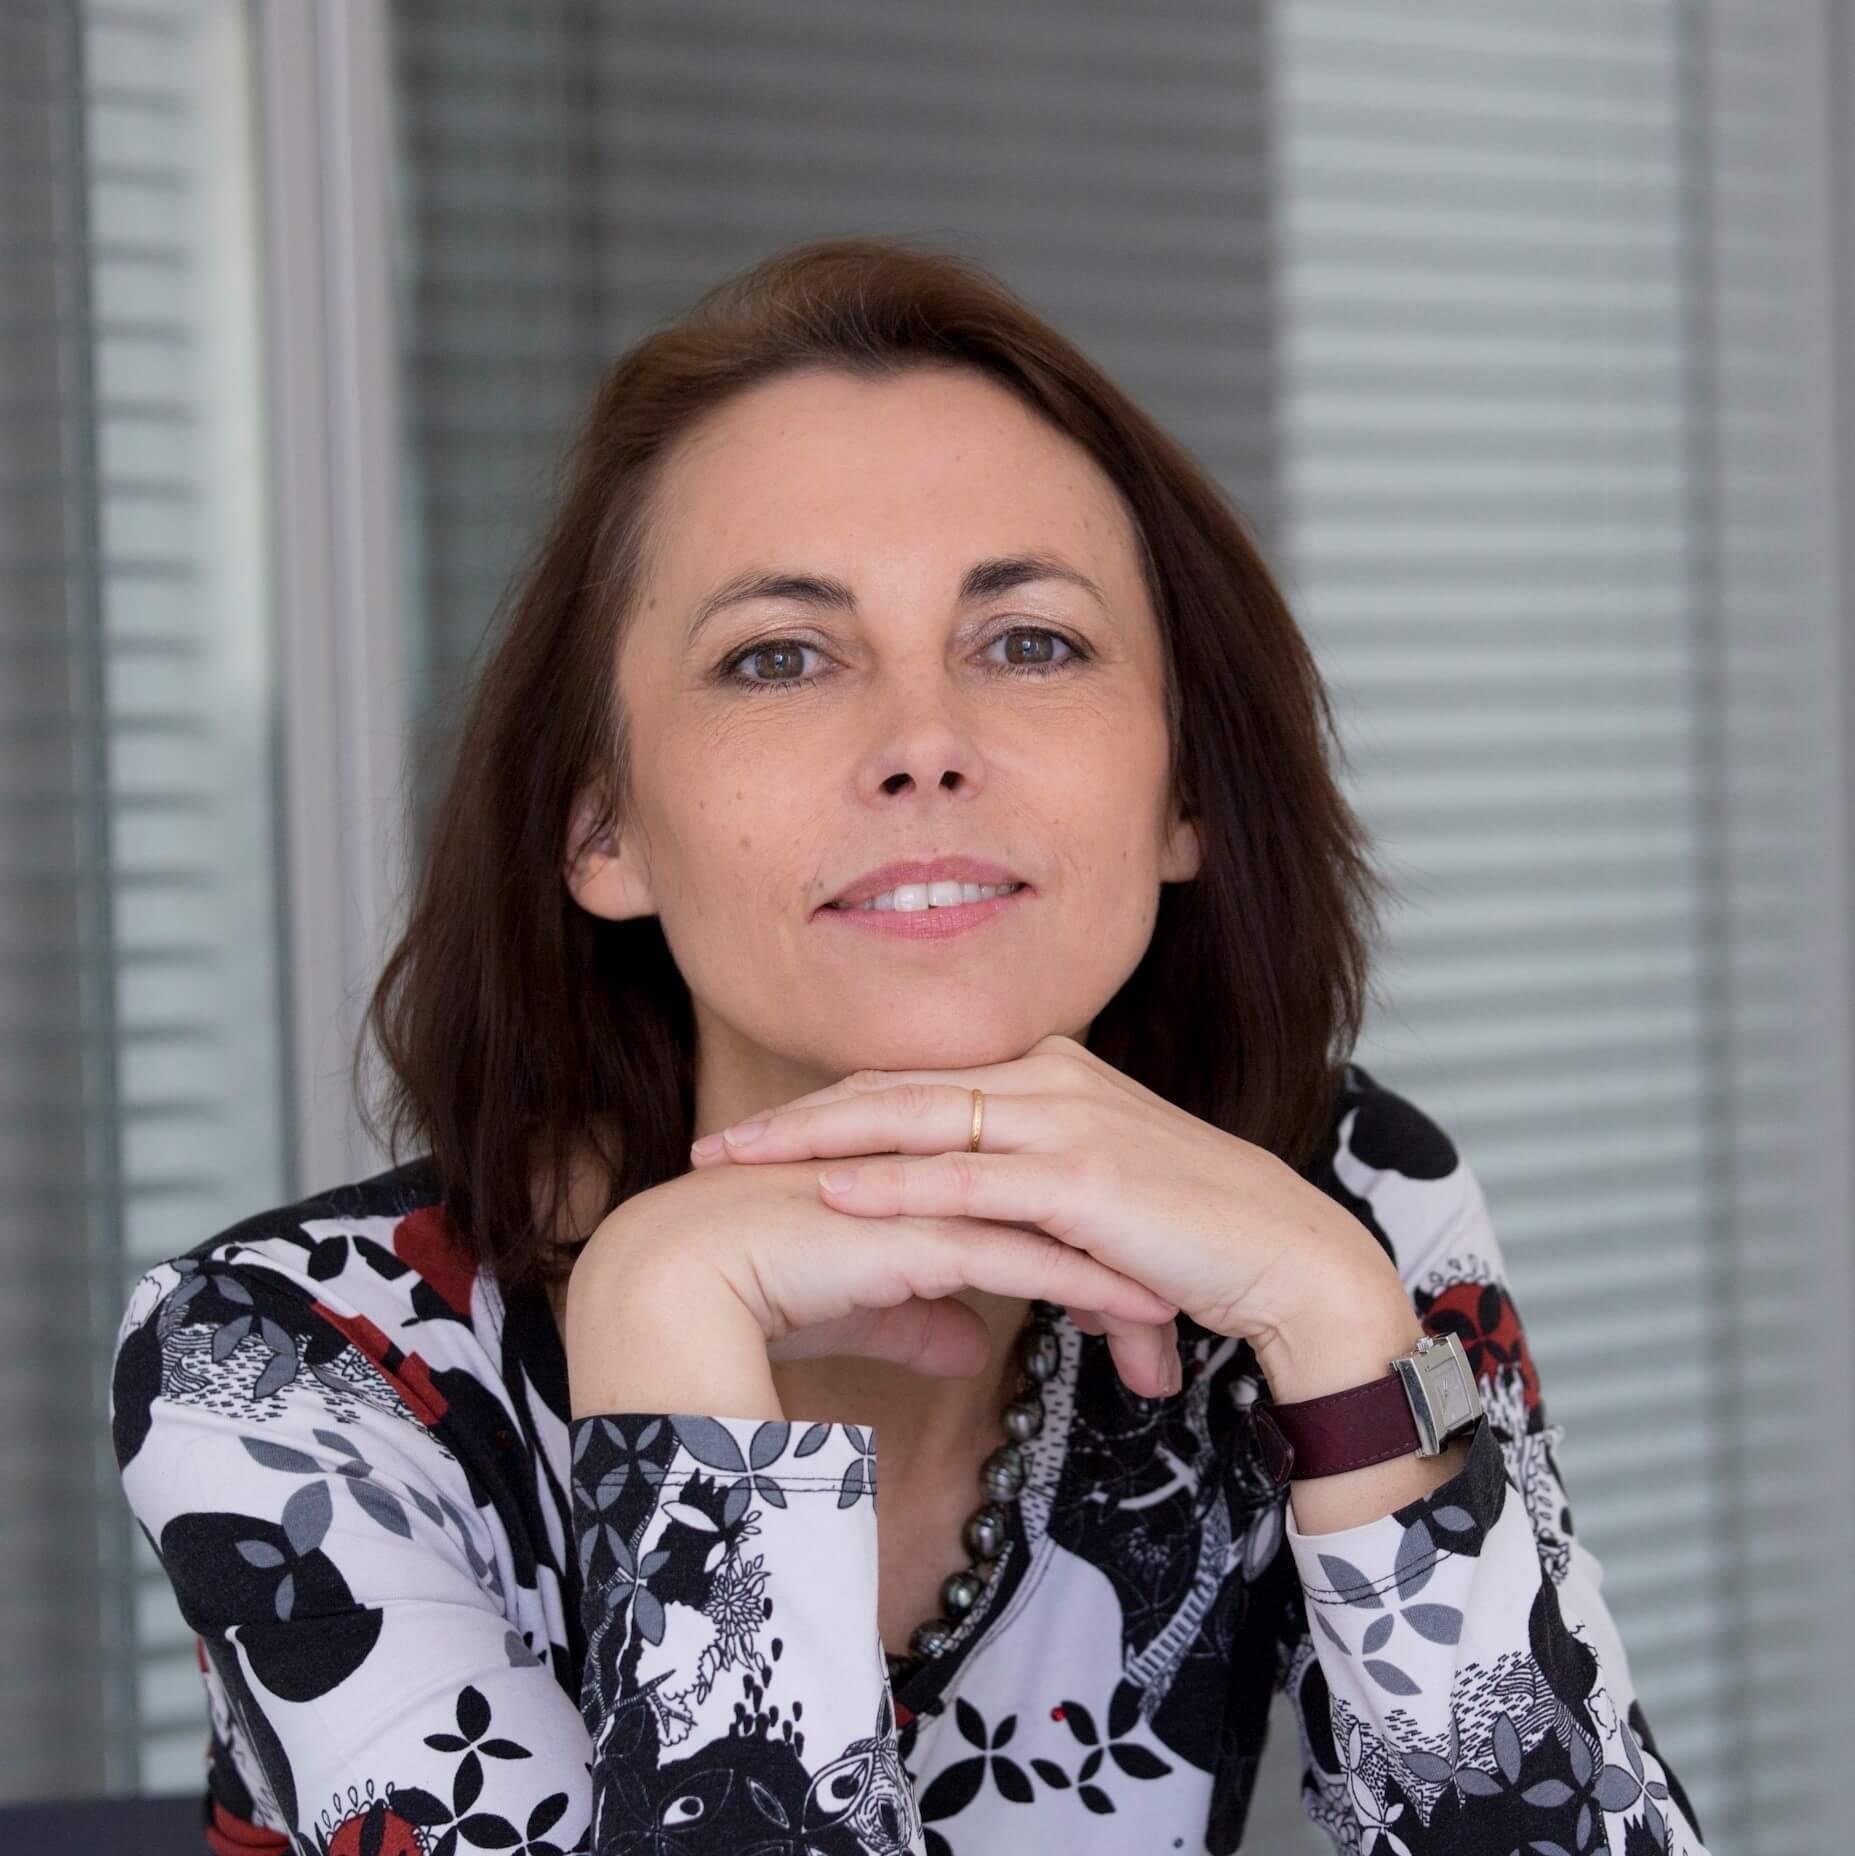 Sophie de Oliveira Leite